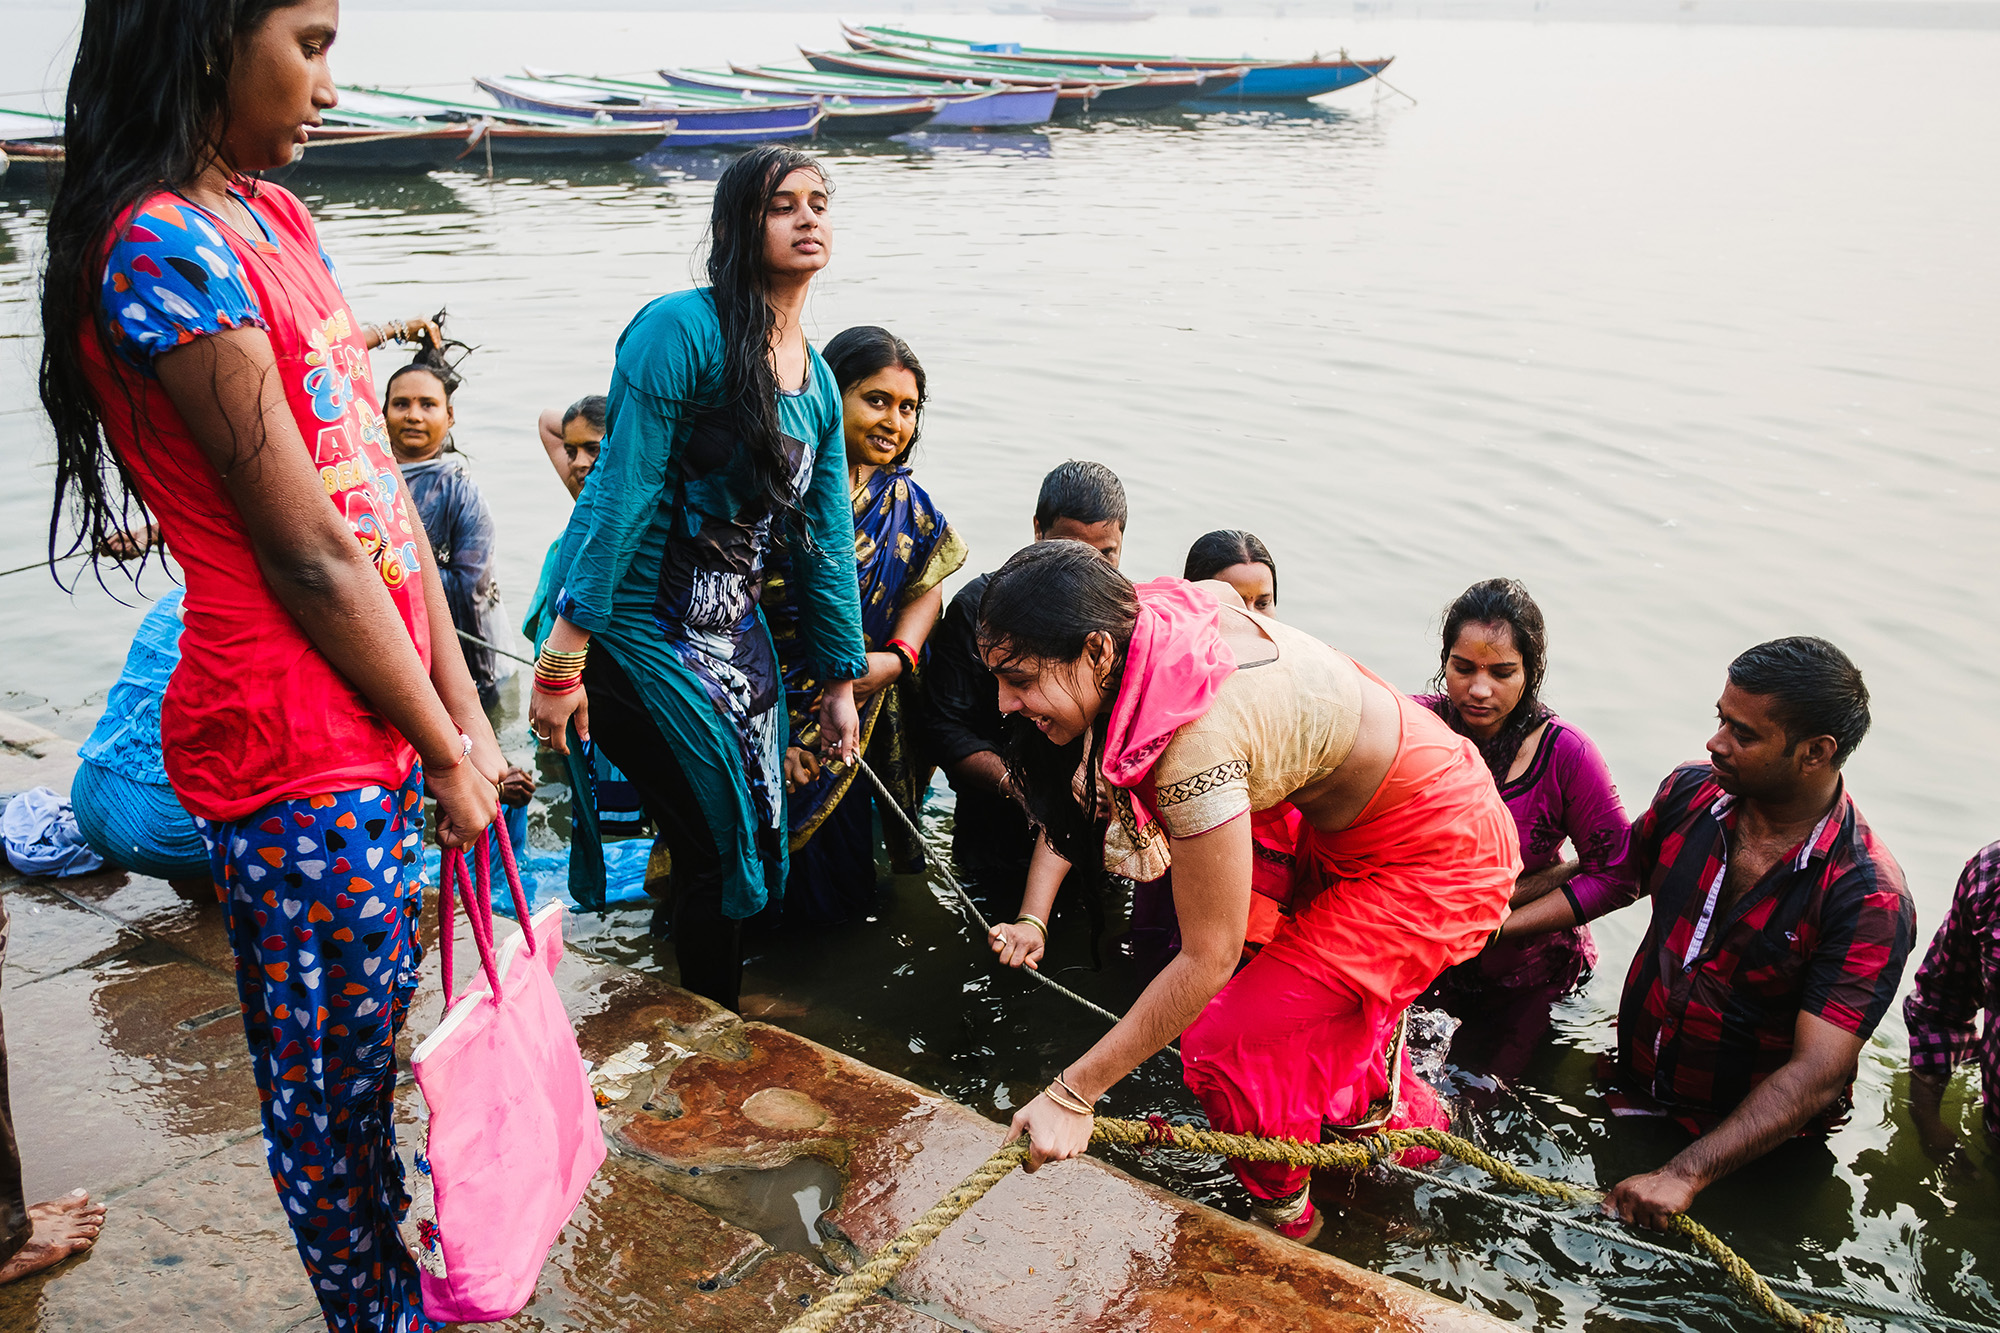 AnjaPoehlmann_India-Varanasi_145.jpg